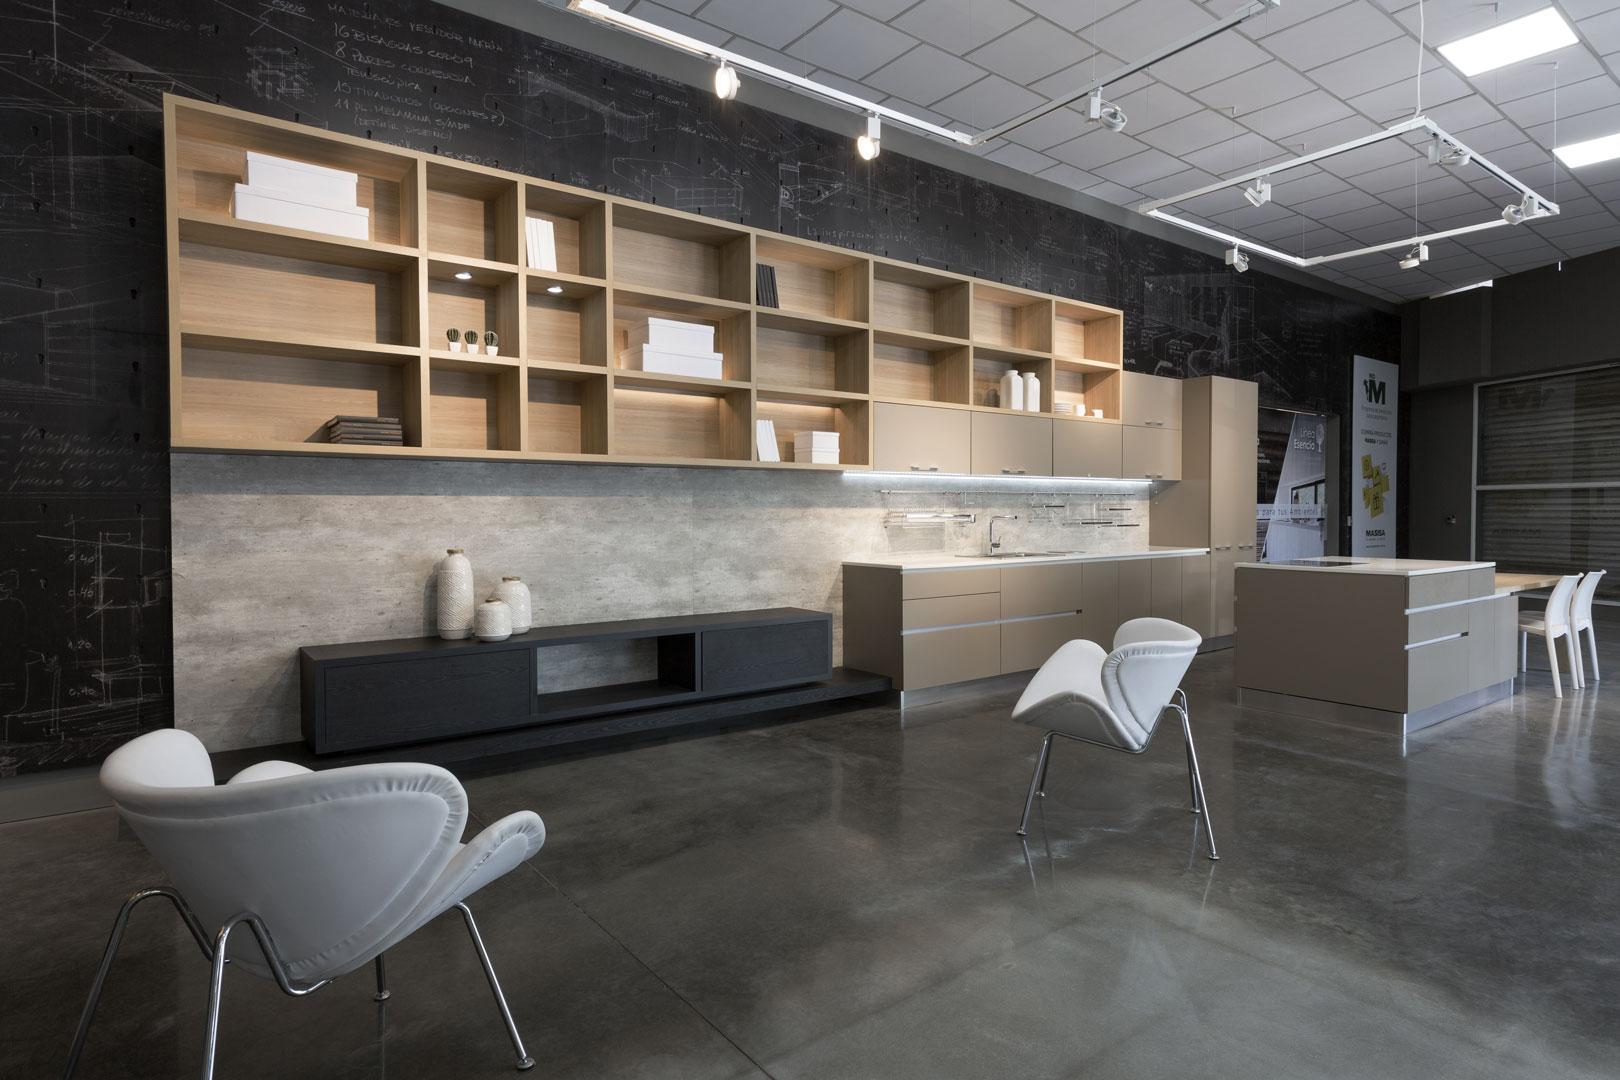 Mobiliario local placacentro masisa linke 30 diseño estratégico